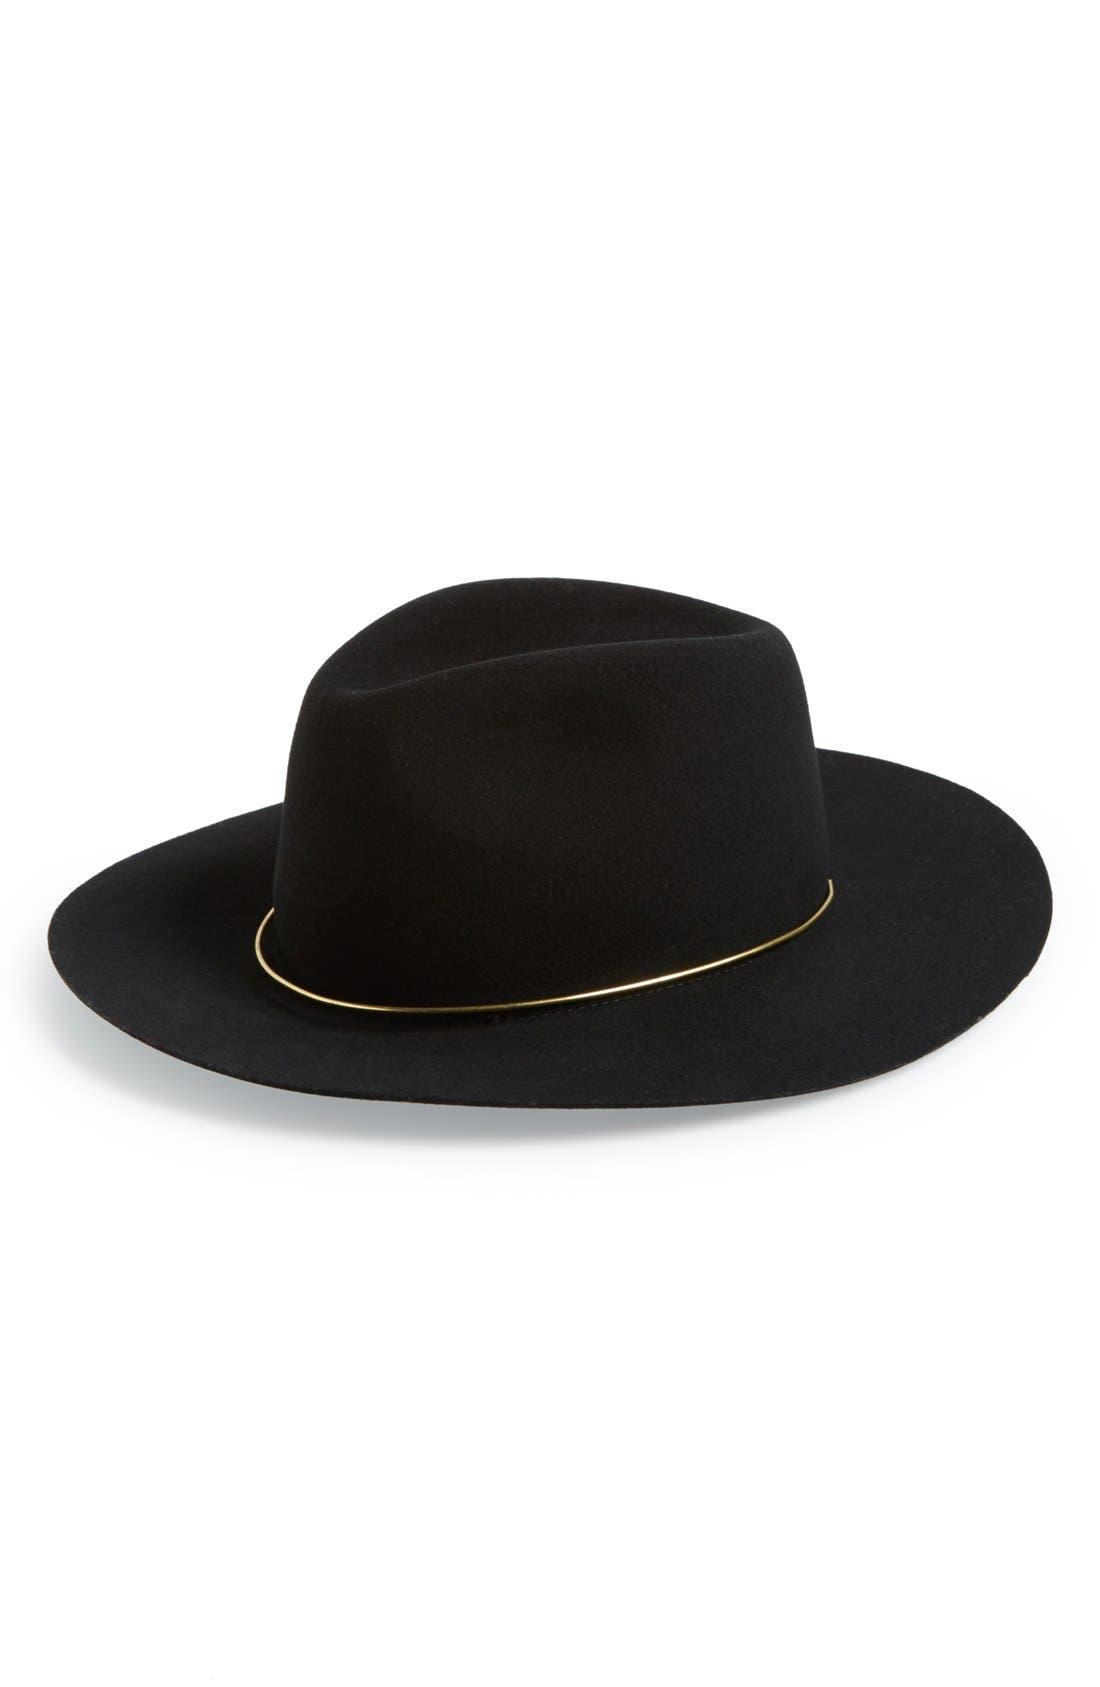 'Savoy' Hat,                             Main thumbnail 1, color,                             Black